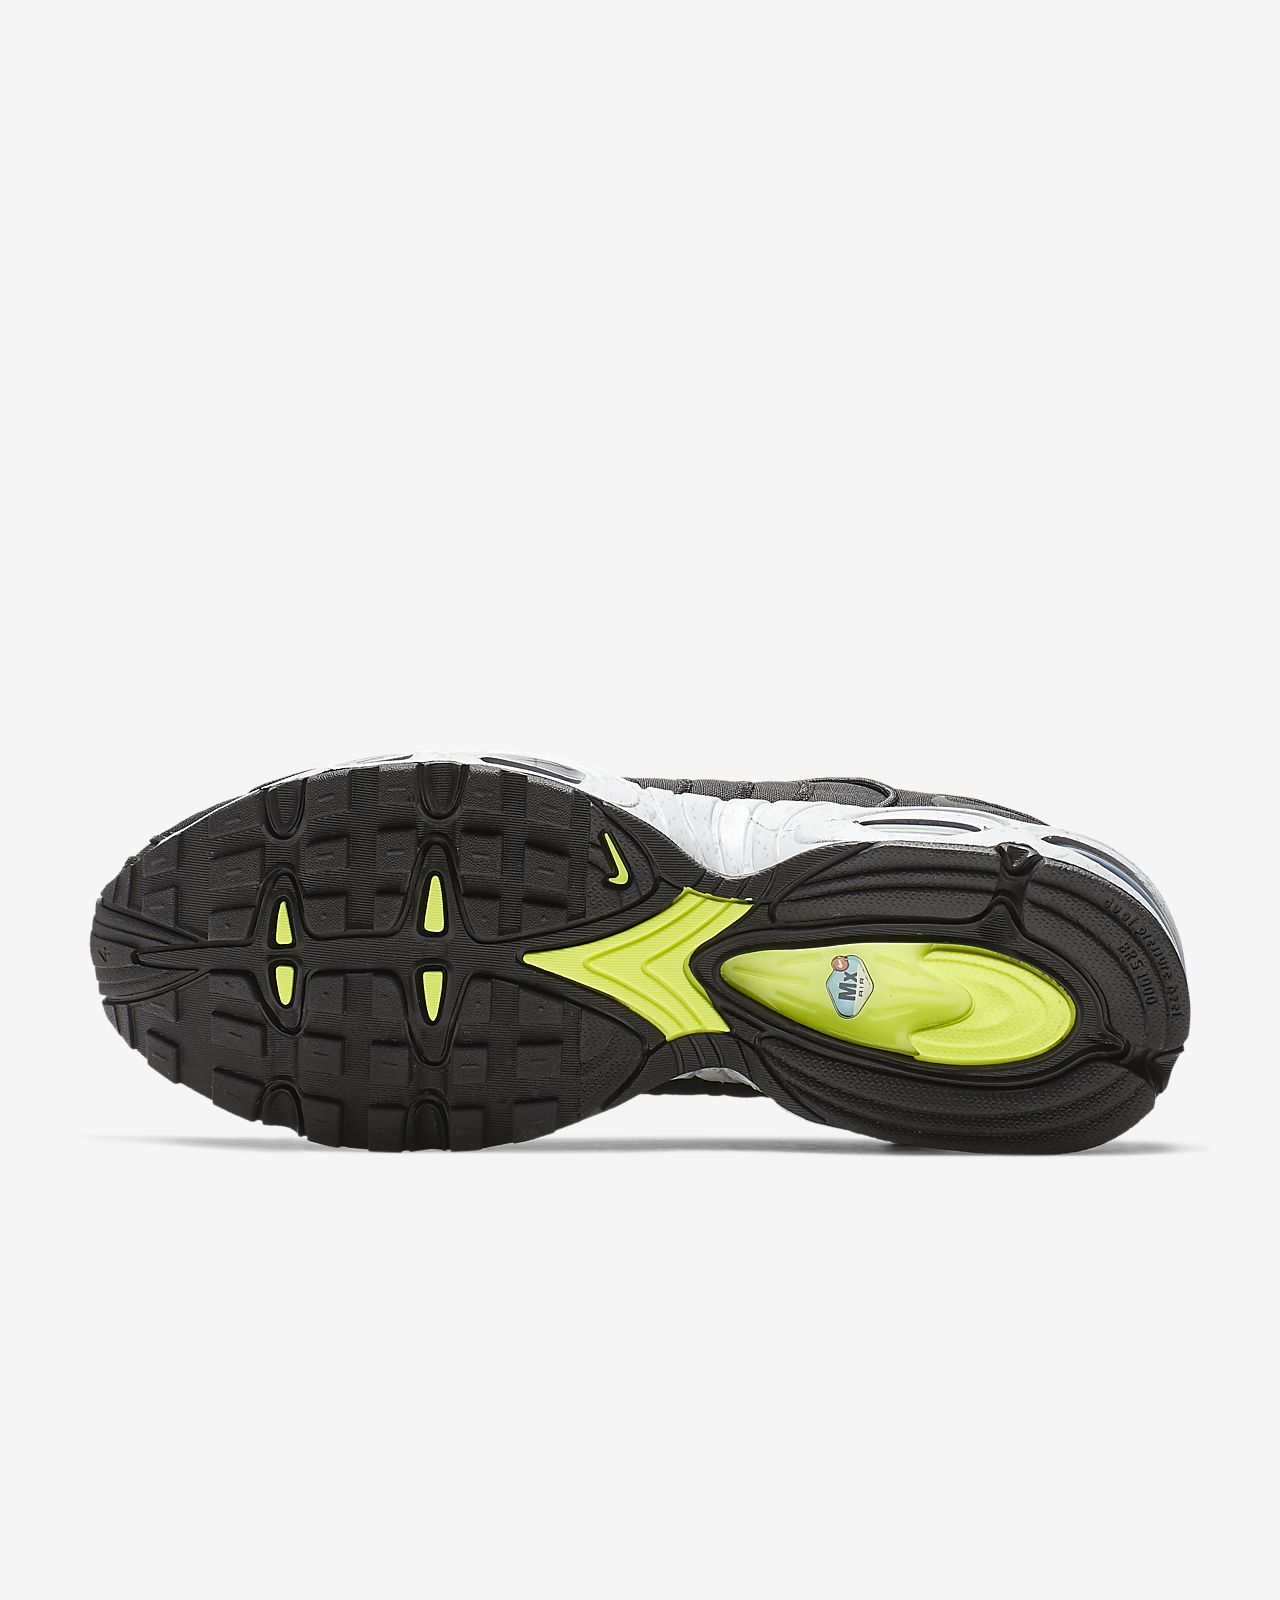 Max Pour Tailwind Iv Air Sp Chaussure Nike Homme 4L5ARj3q